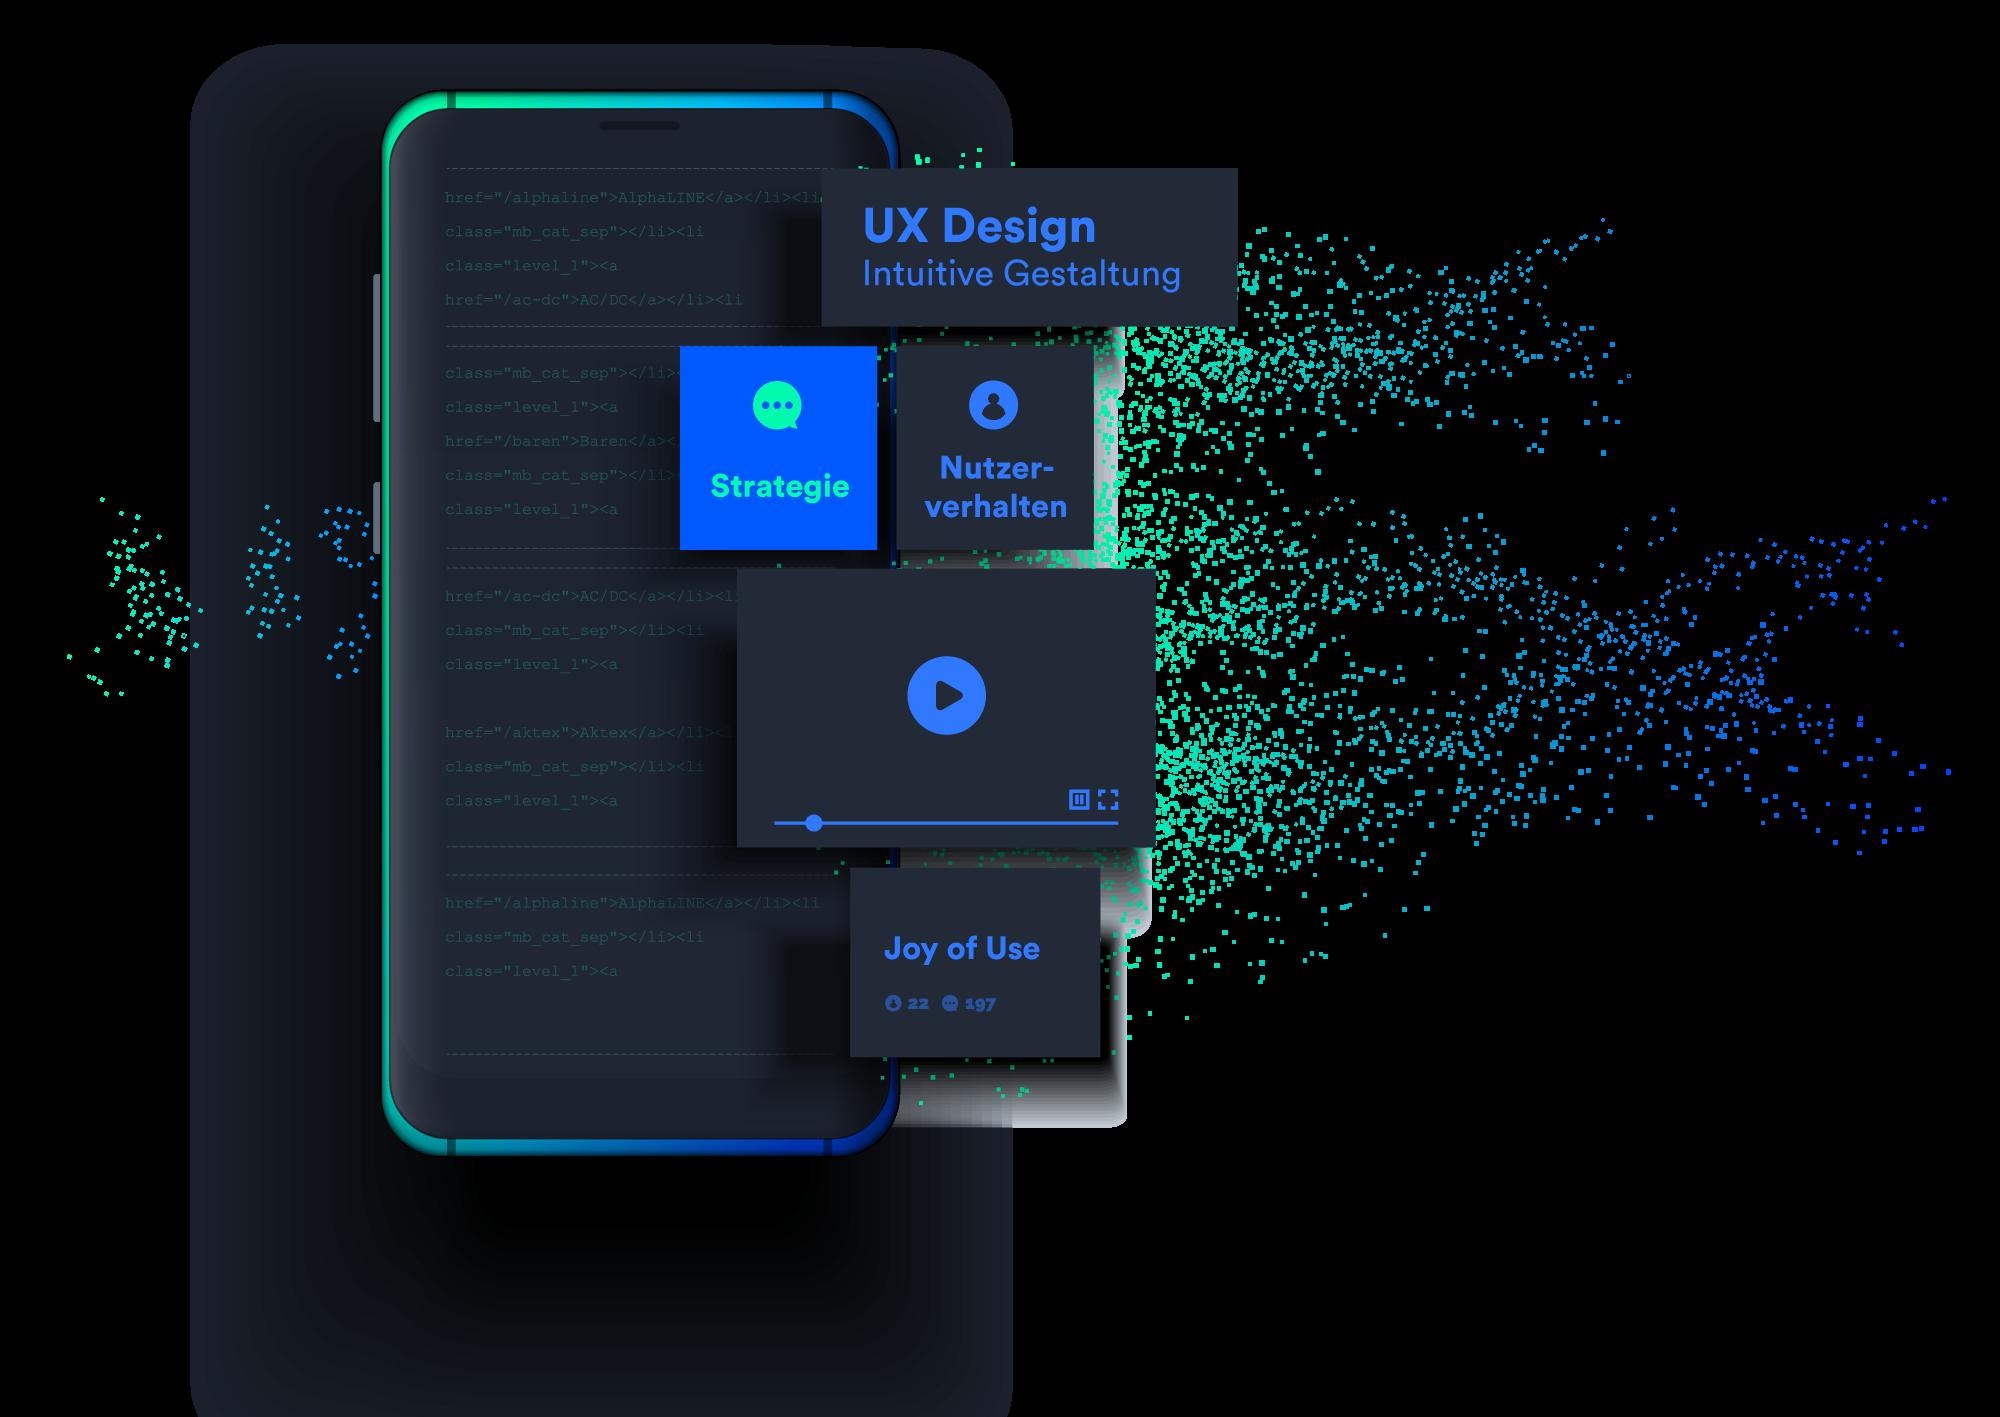 kopfmedia-werbeagentur-offenburg-user-experience-design